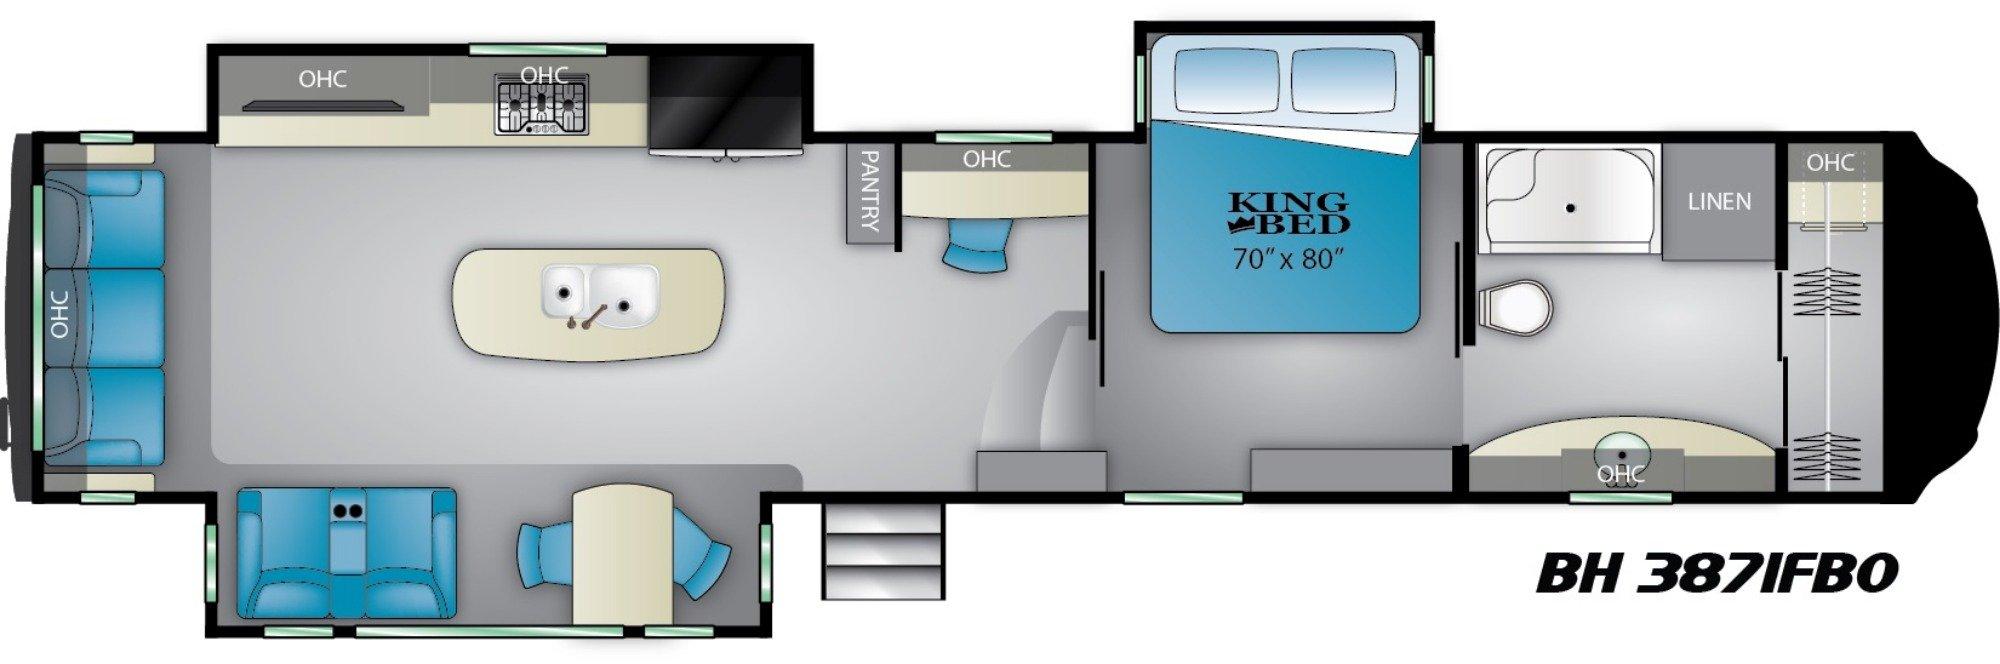 View Floor Plan for 2019 HEARTLAND BIGHORN 3871FBO